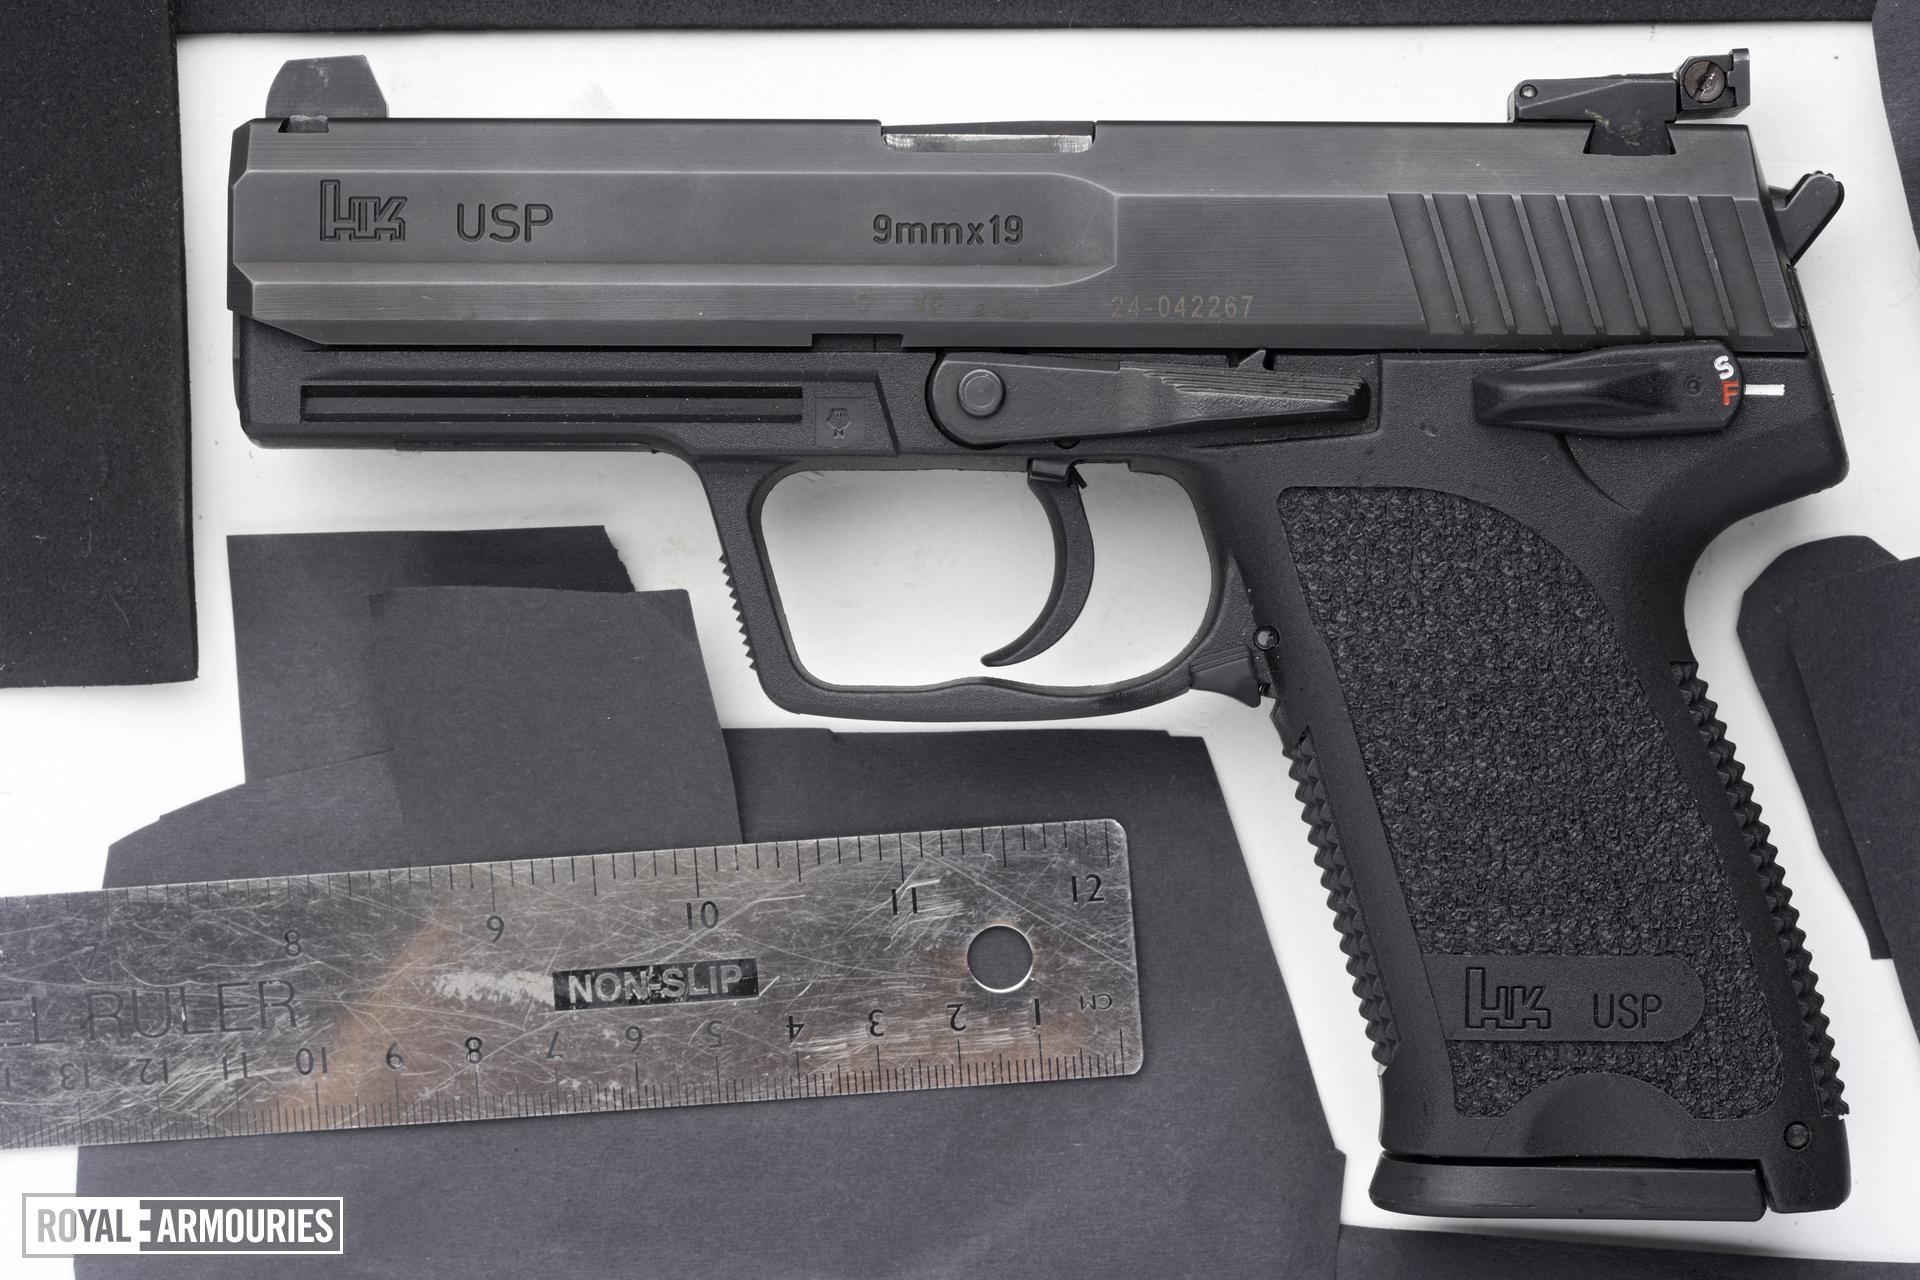 Centrefire self-loading pistol - Heckler and Koch USP